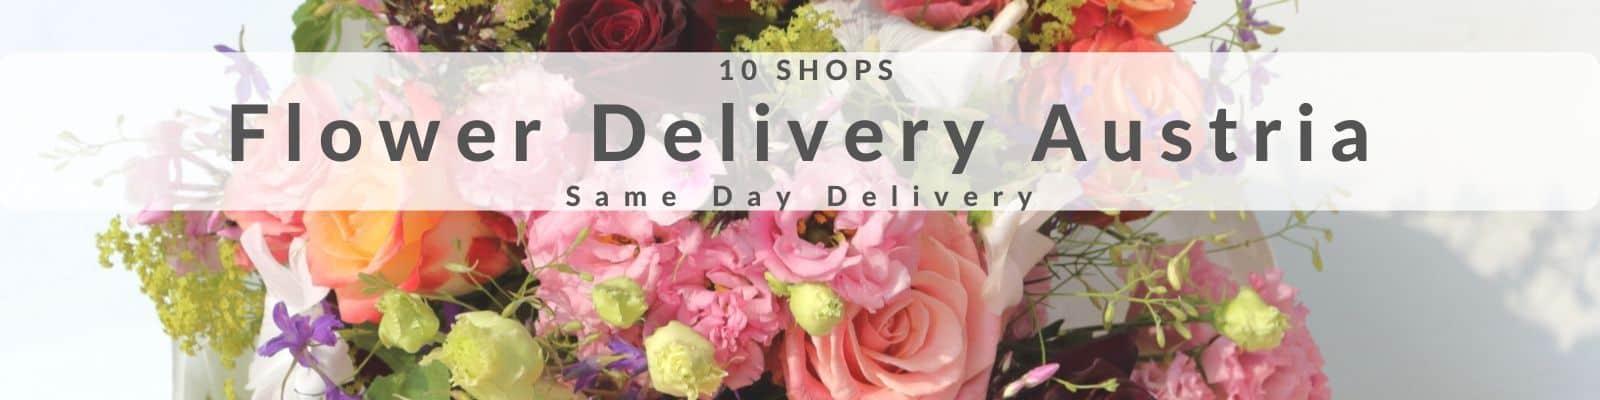 Flower Delivery Austria - Send Flowers to Austria